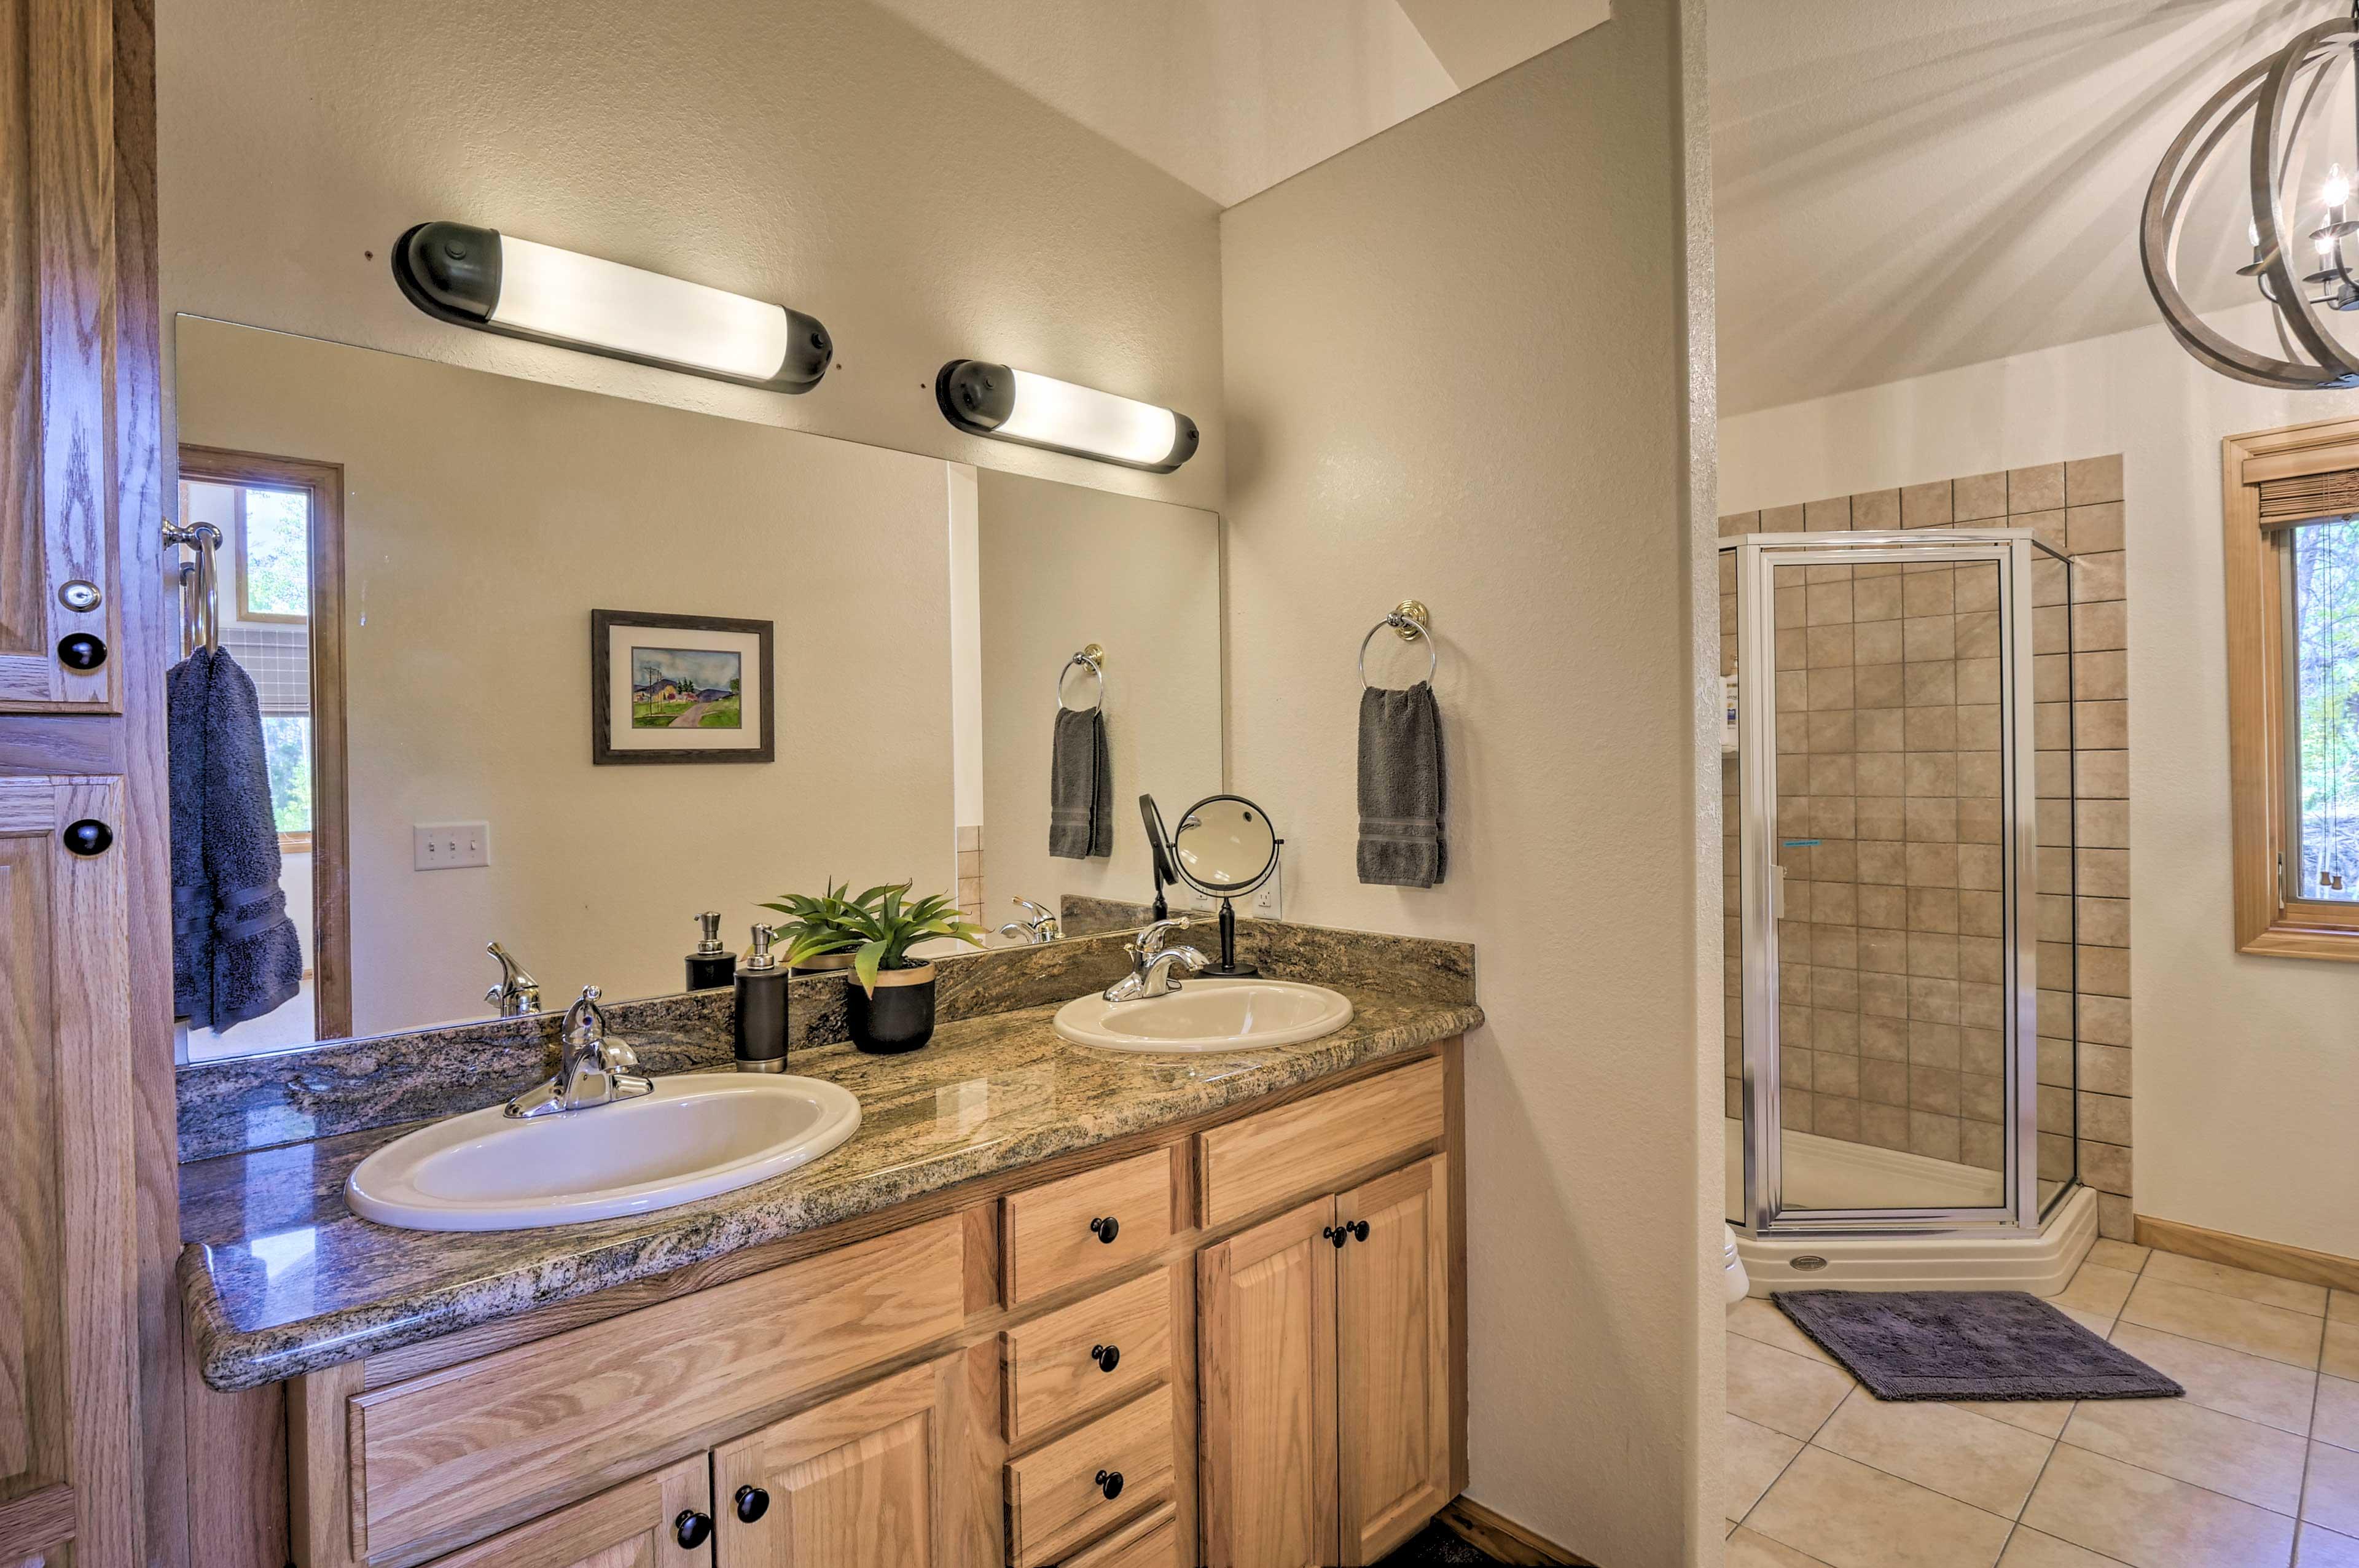 The master bedroom also features an en-suite bathroom.